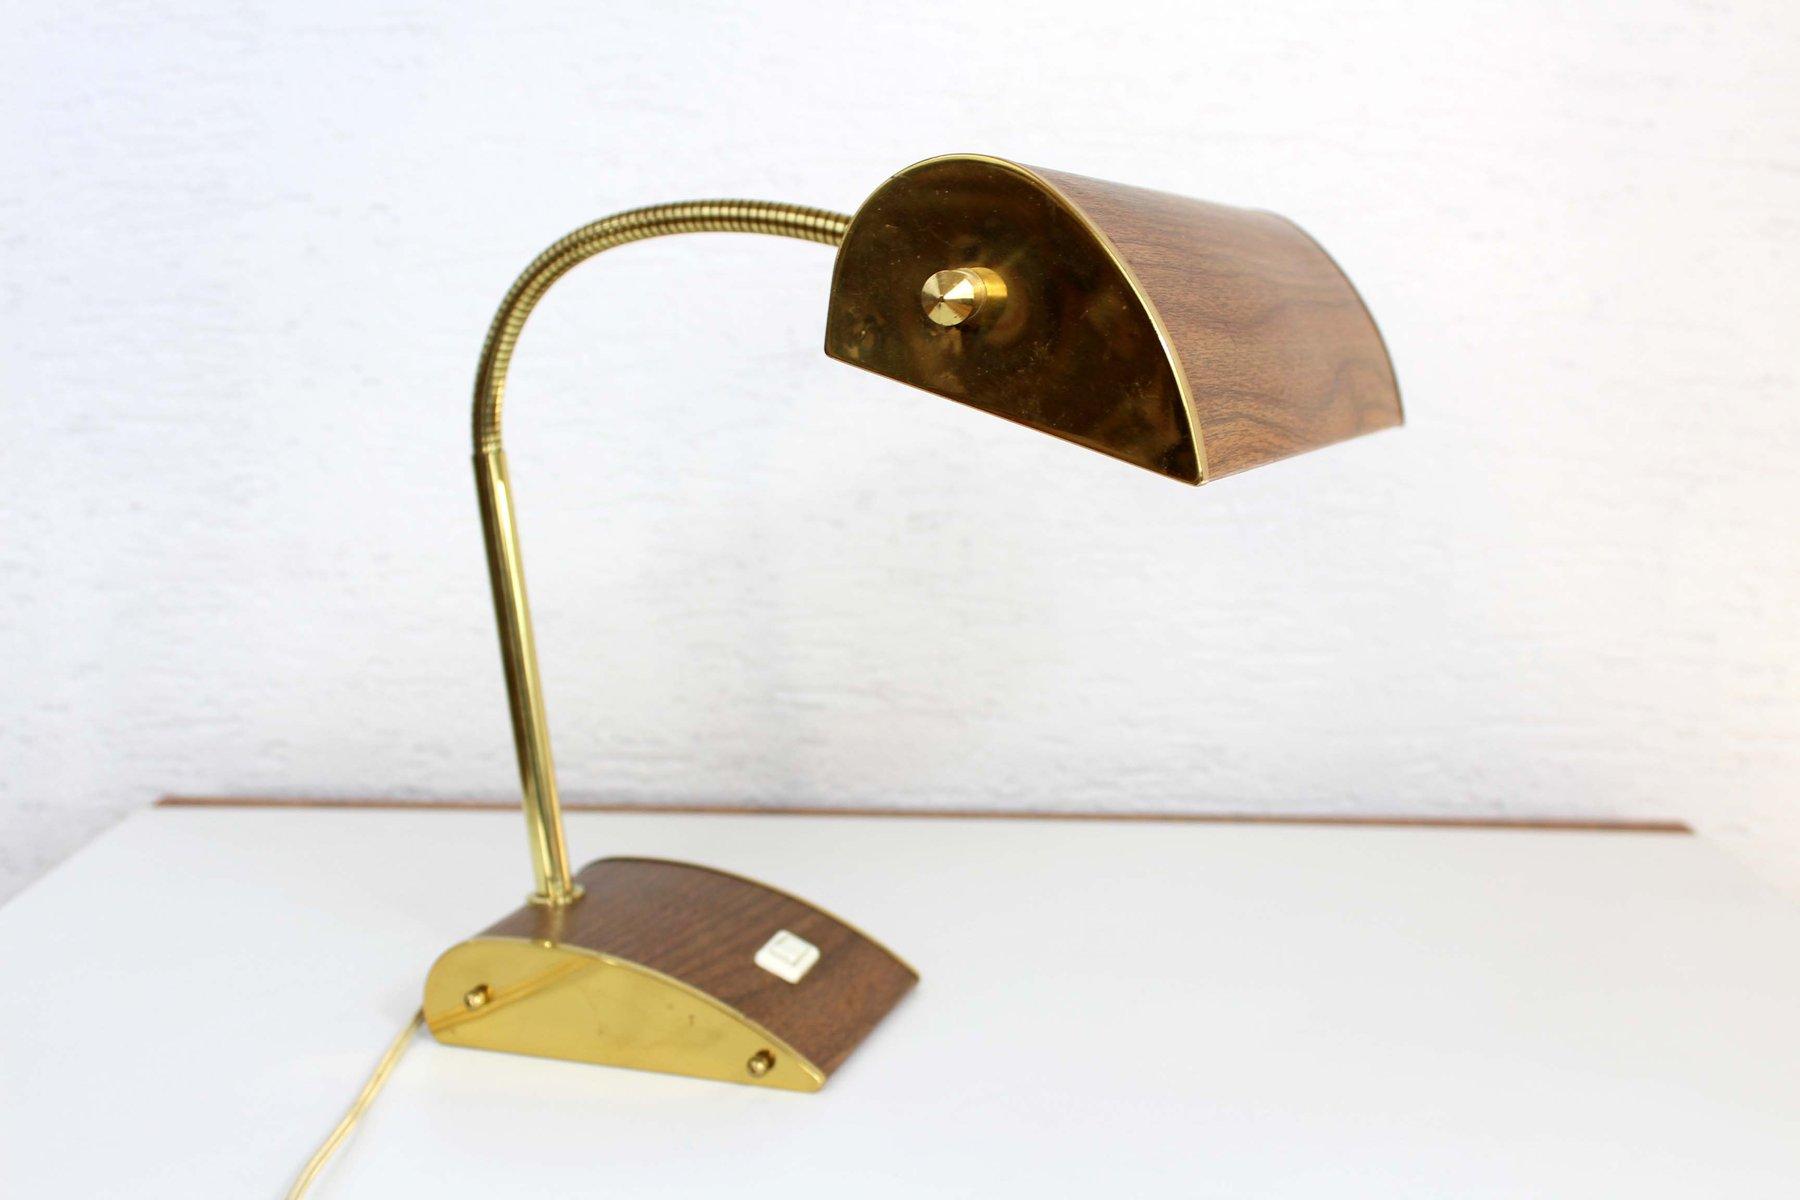 Vintage Desk Lamp, 1950s for sale at Pamono